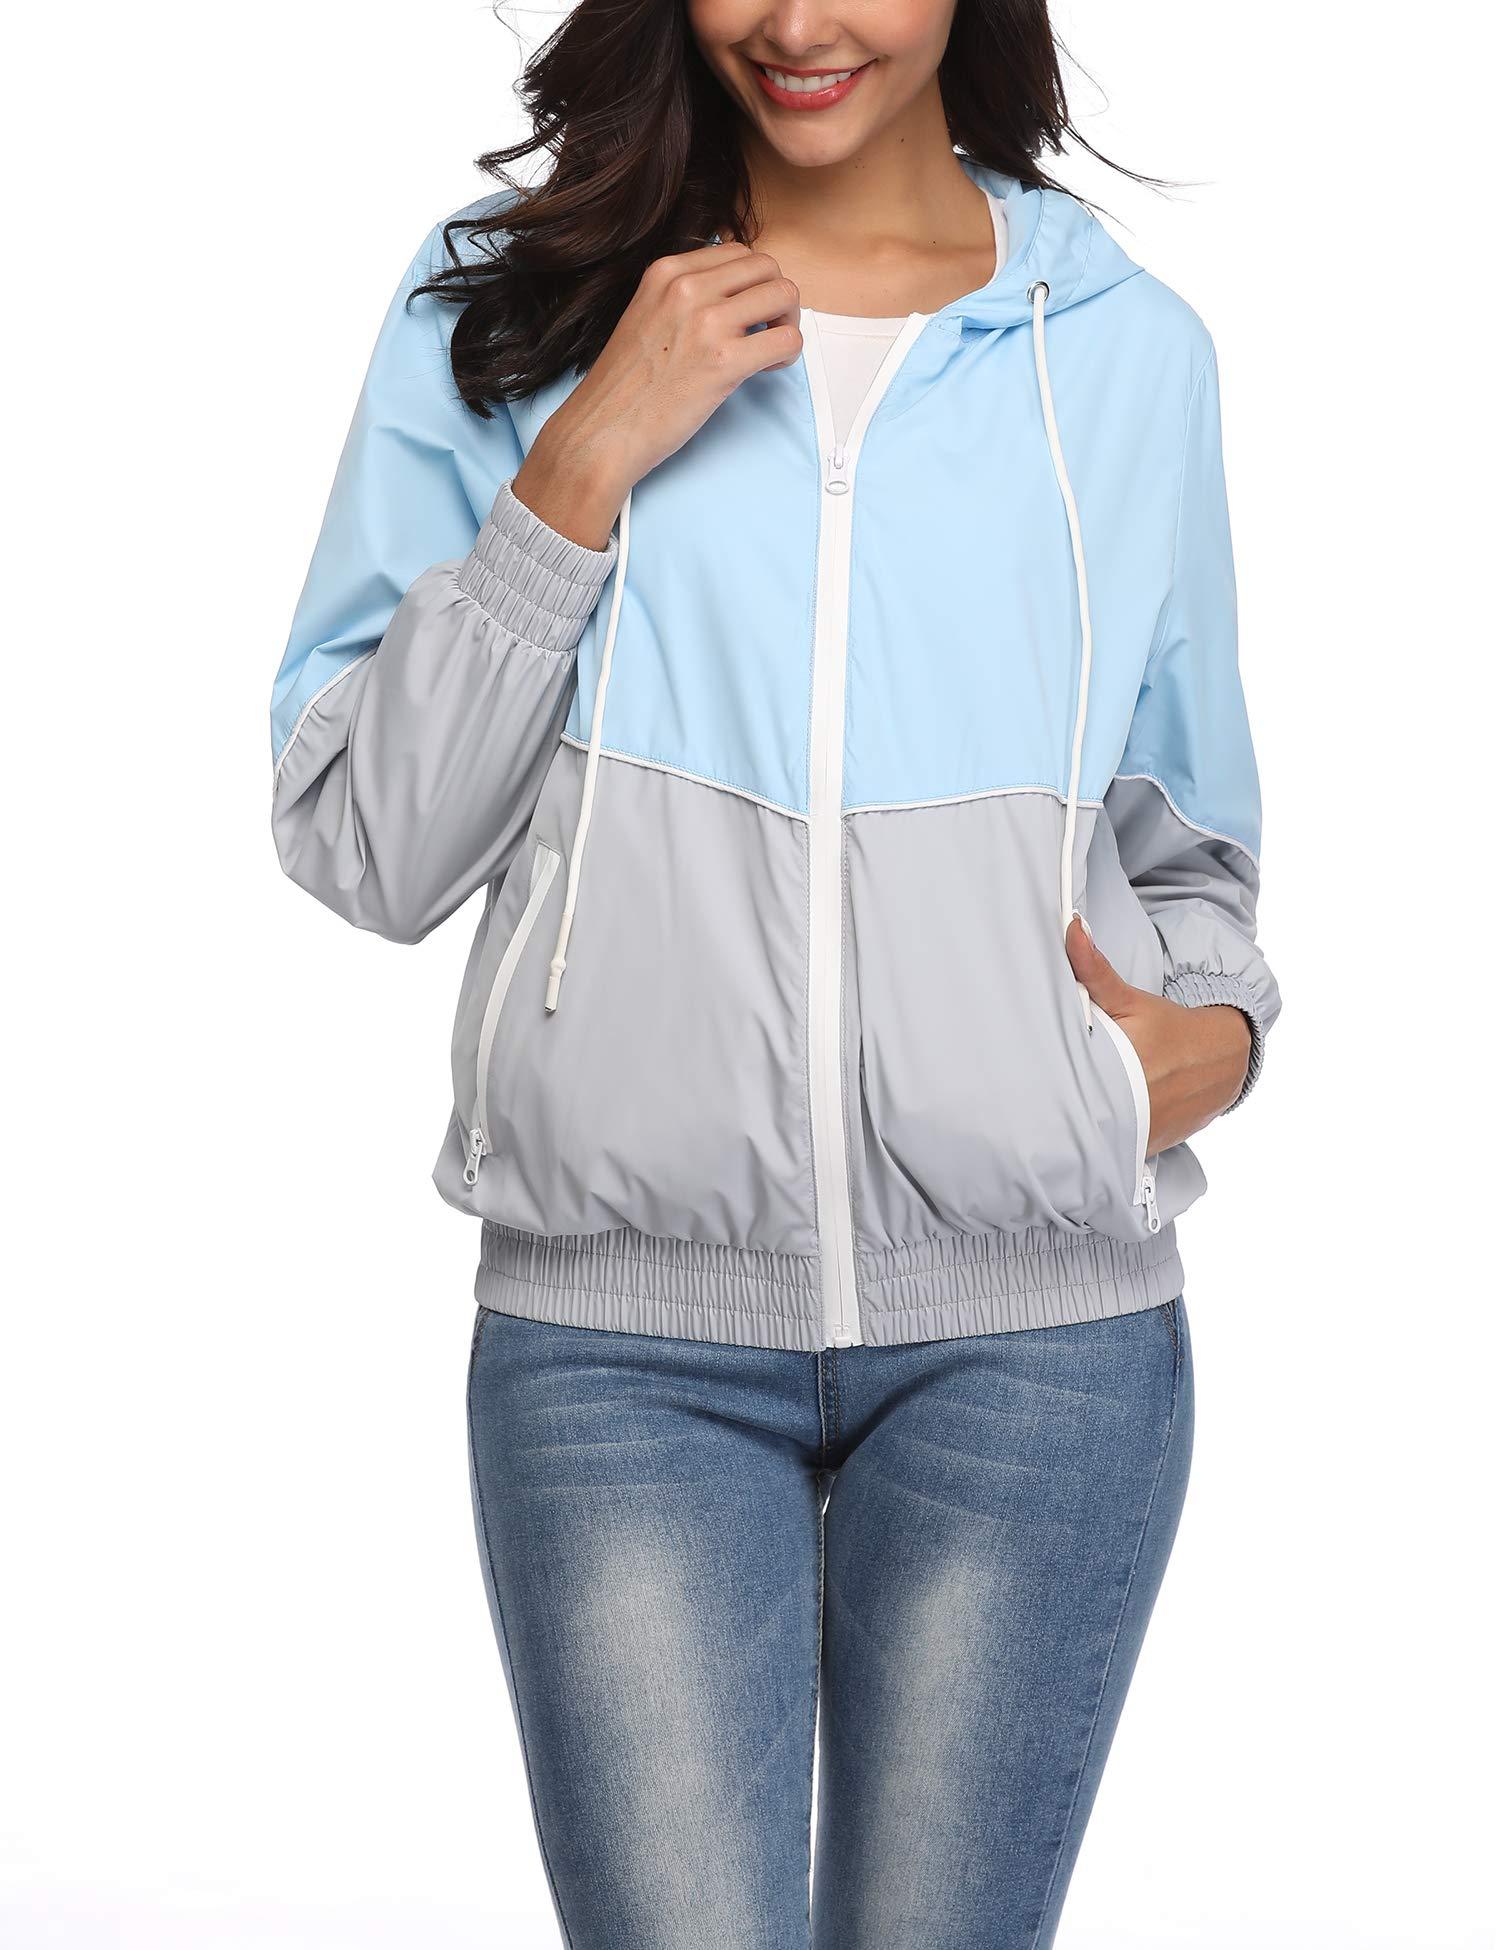 Rain Jacket for Women Waterproof with Hood Lightweight Outdoor Research Travel